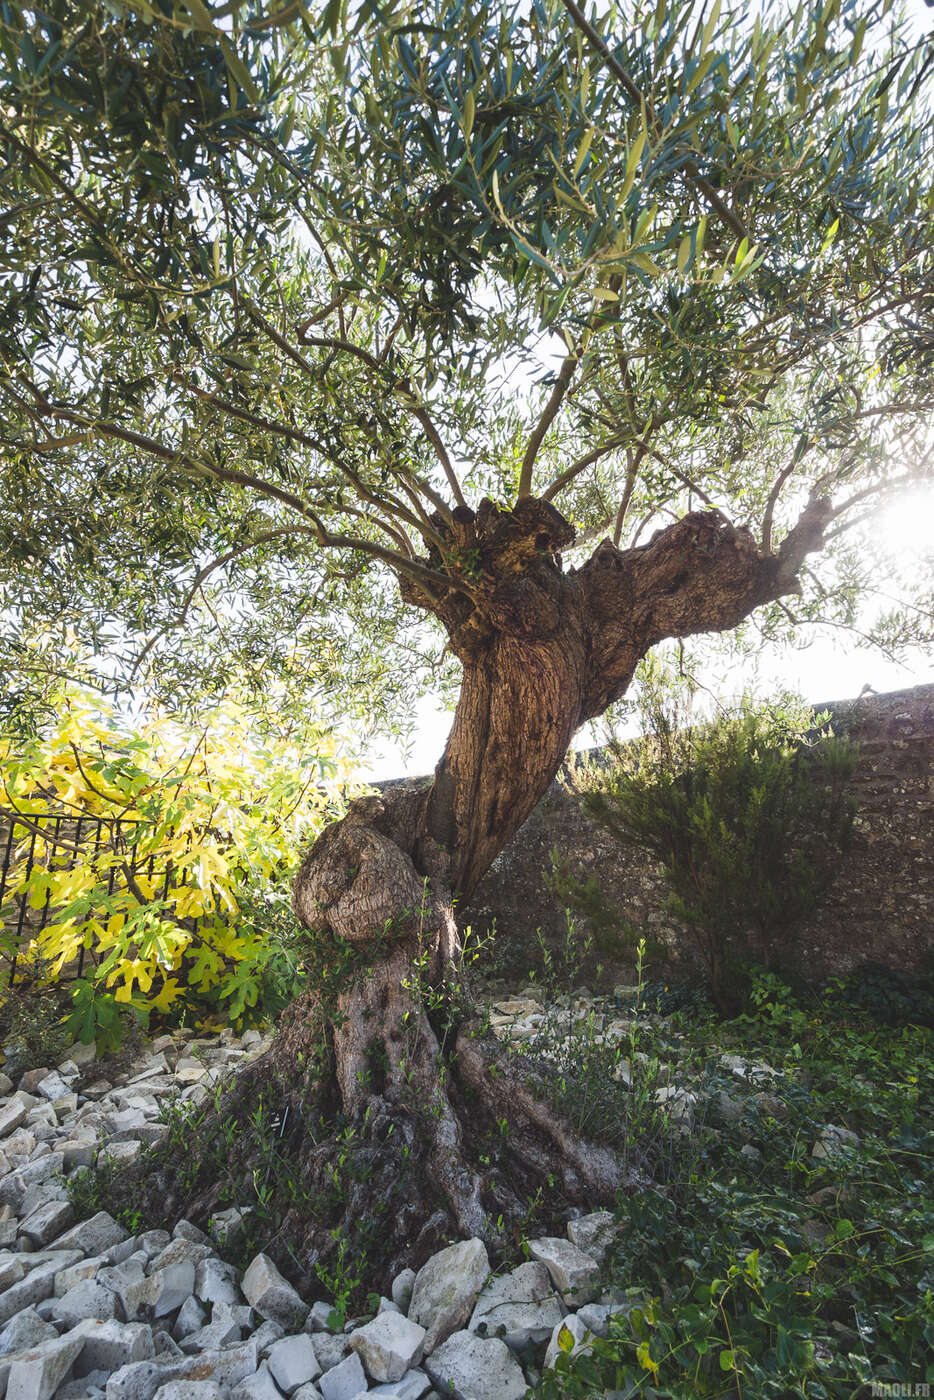 Jardin de la Retraite, Quimper